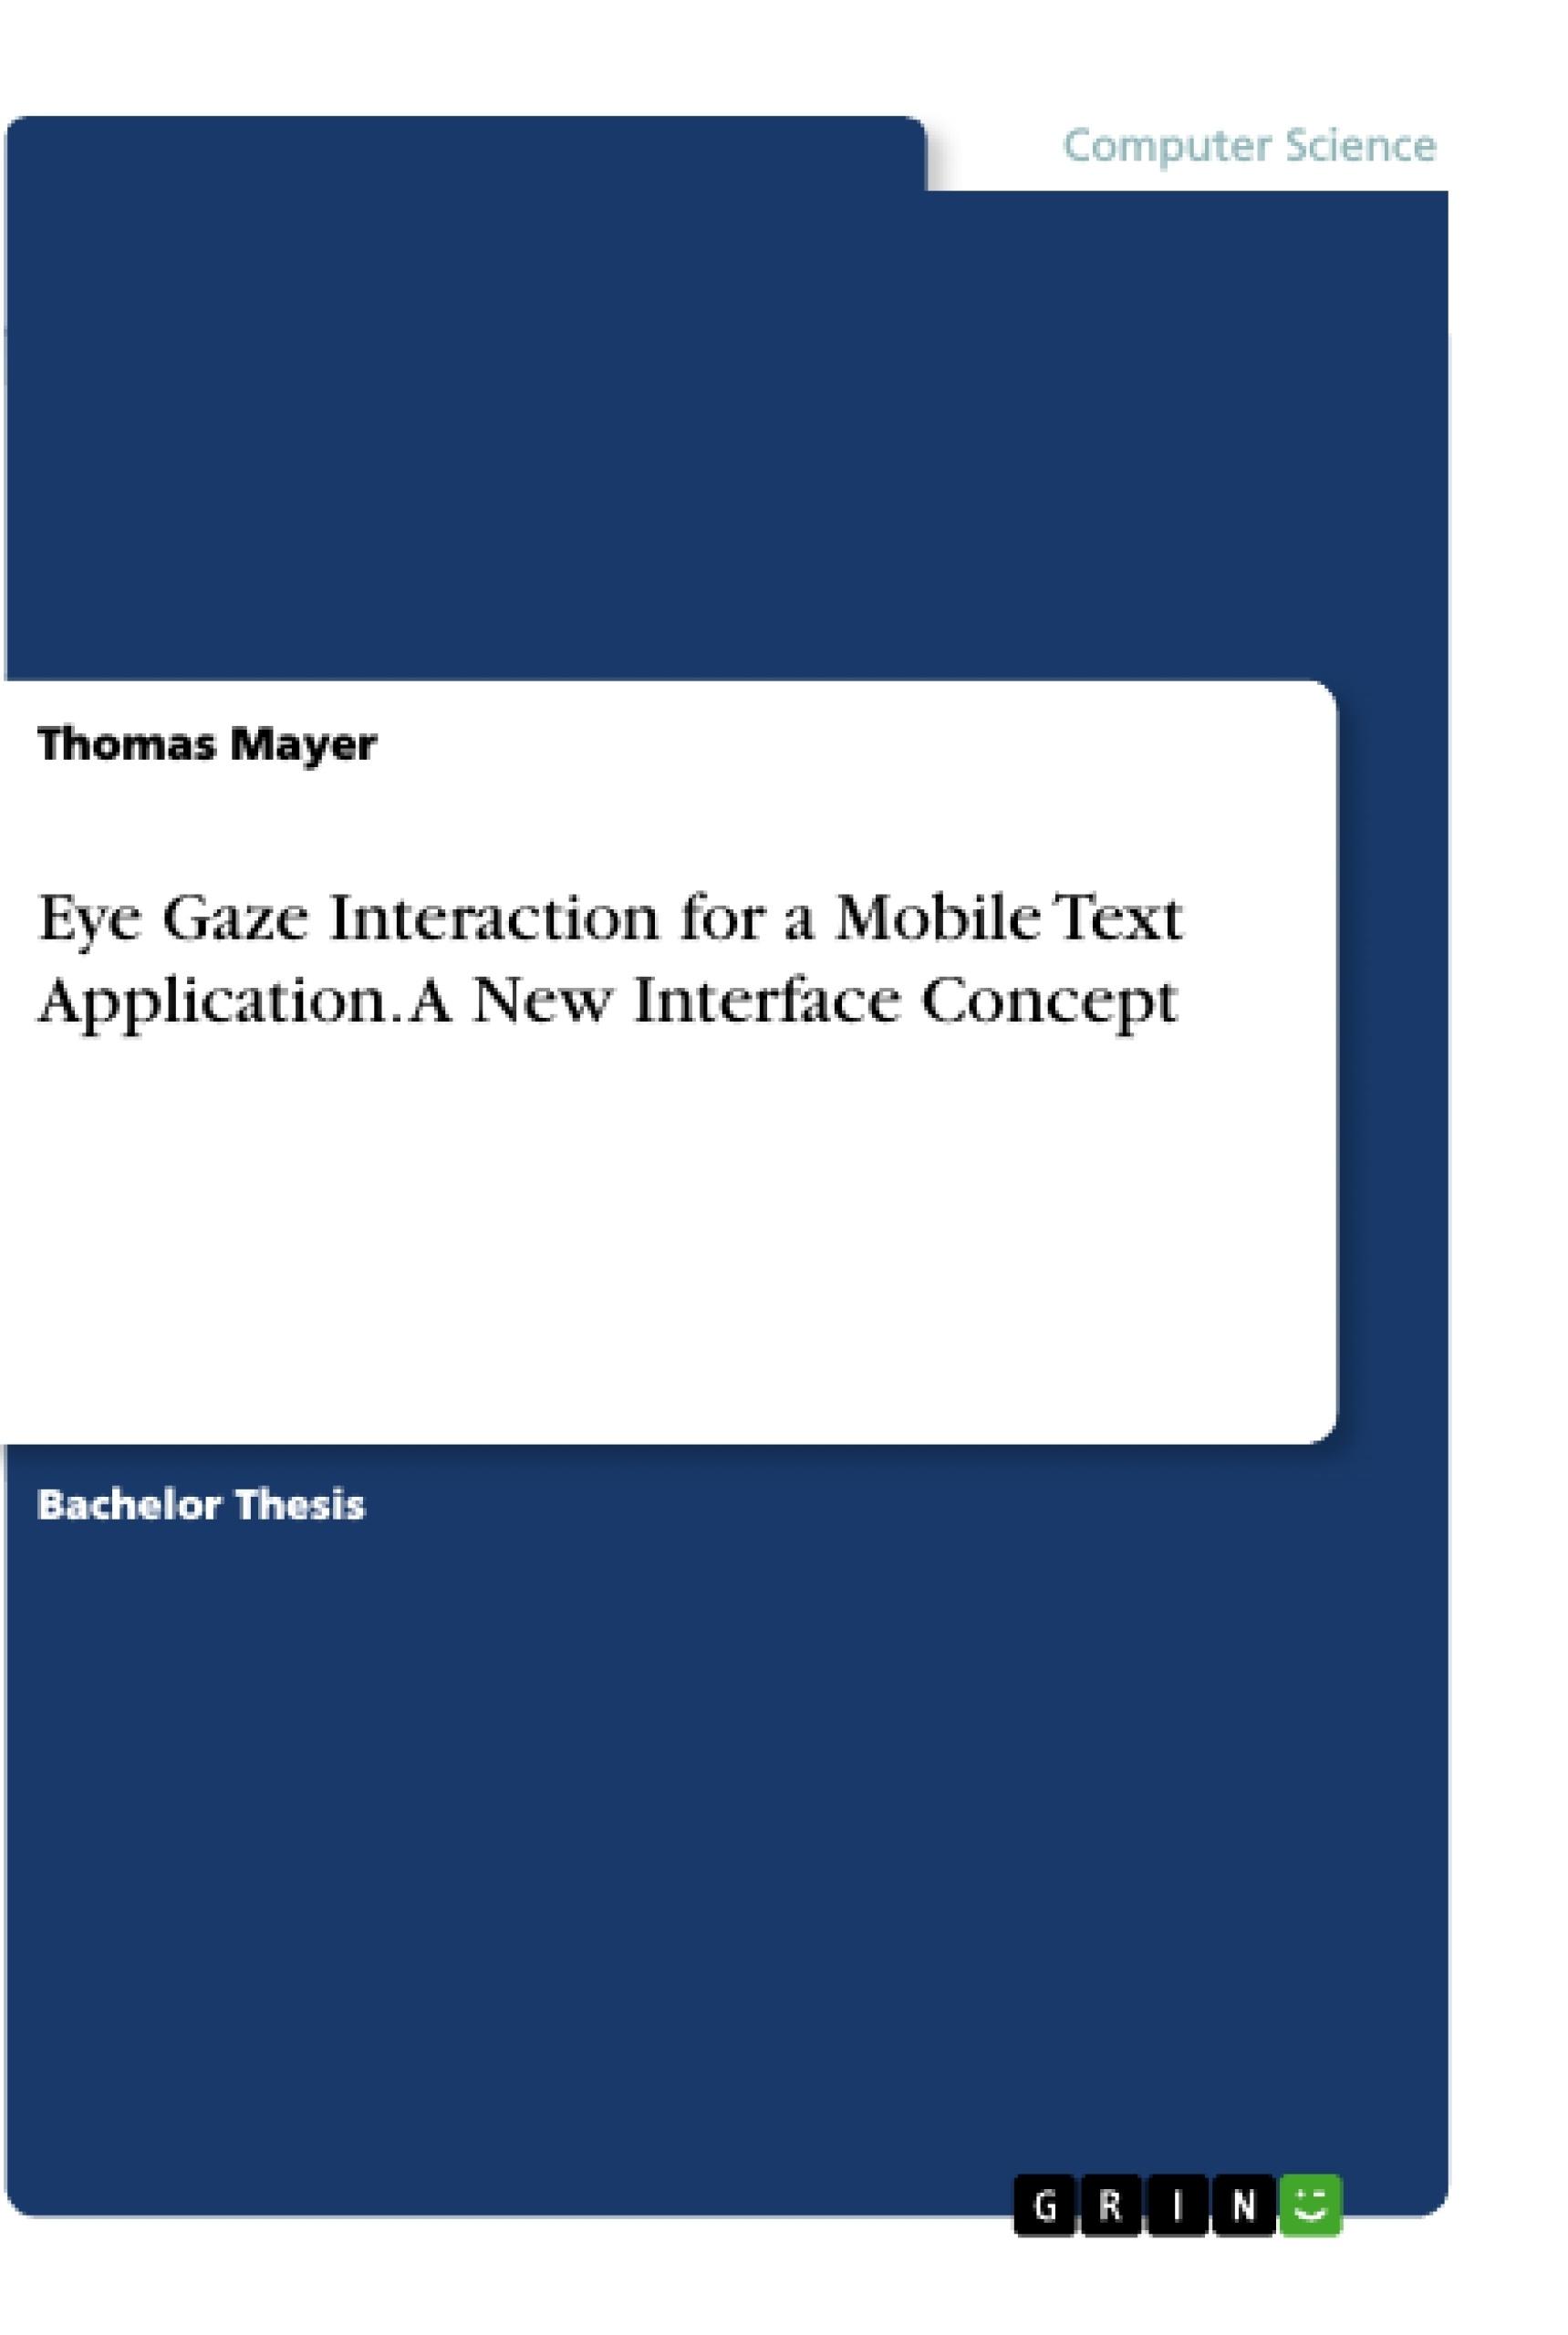 Title: Eye Gaze Interaction for a Mobile Text Application. A New Interface Concept